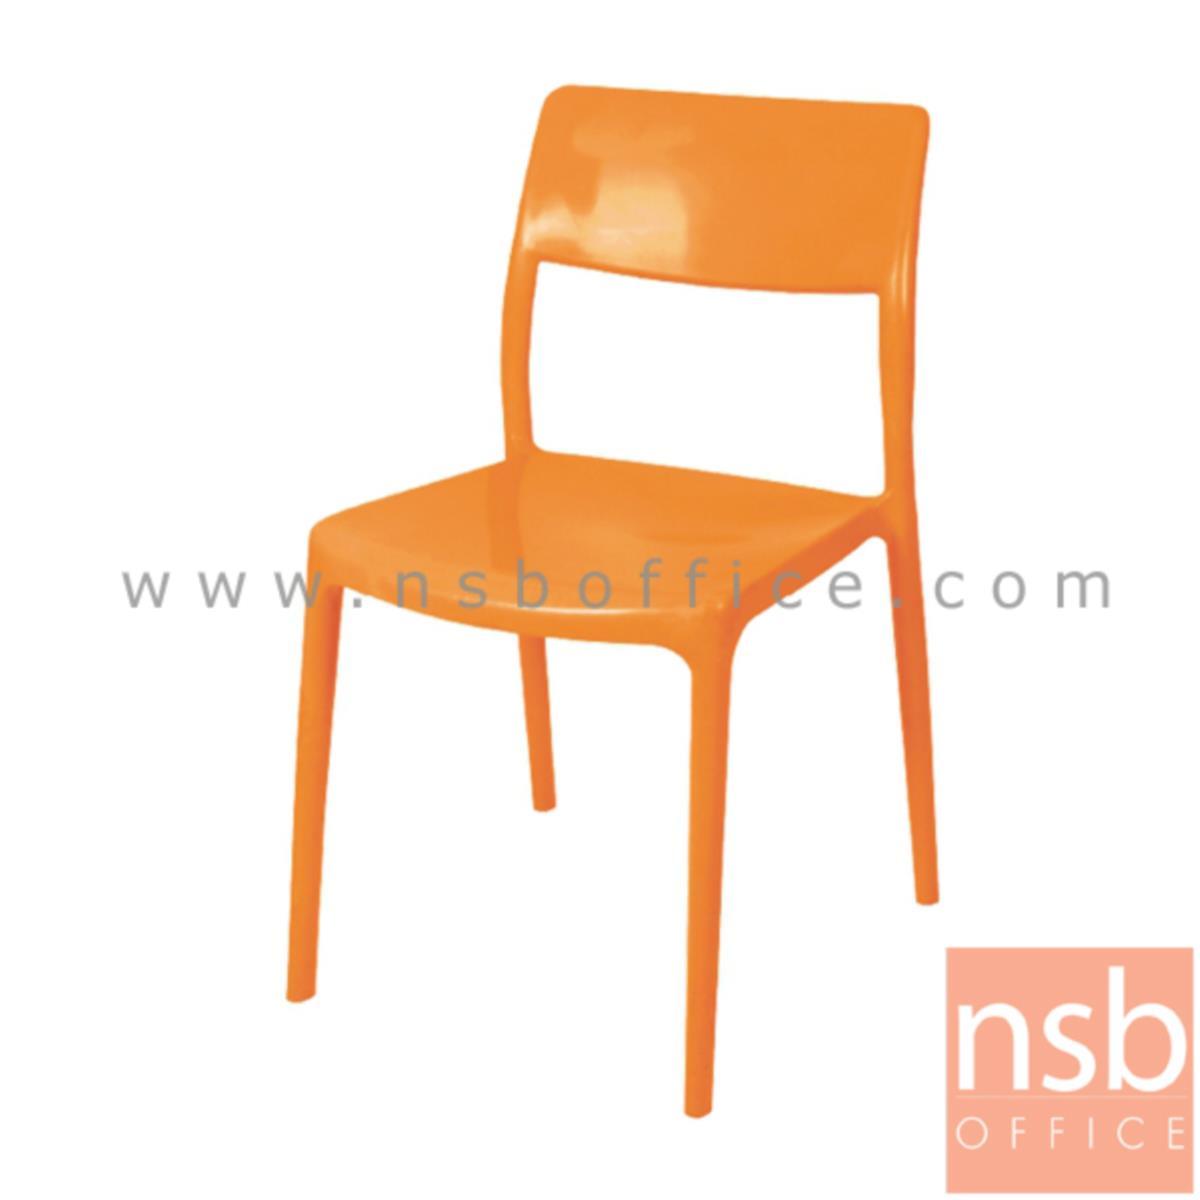 B11A030:เก้าอี้โมเดิร์นพลาสติก(PP)ล้วน รุ่น PI-NG73 ขนาด 46W cm.